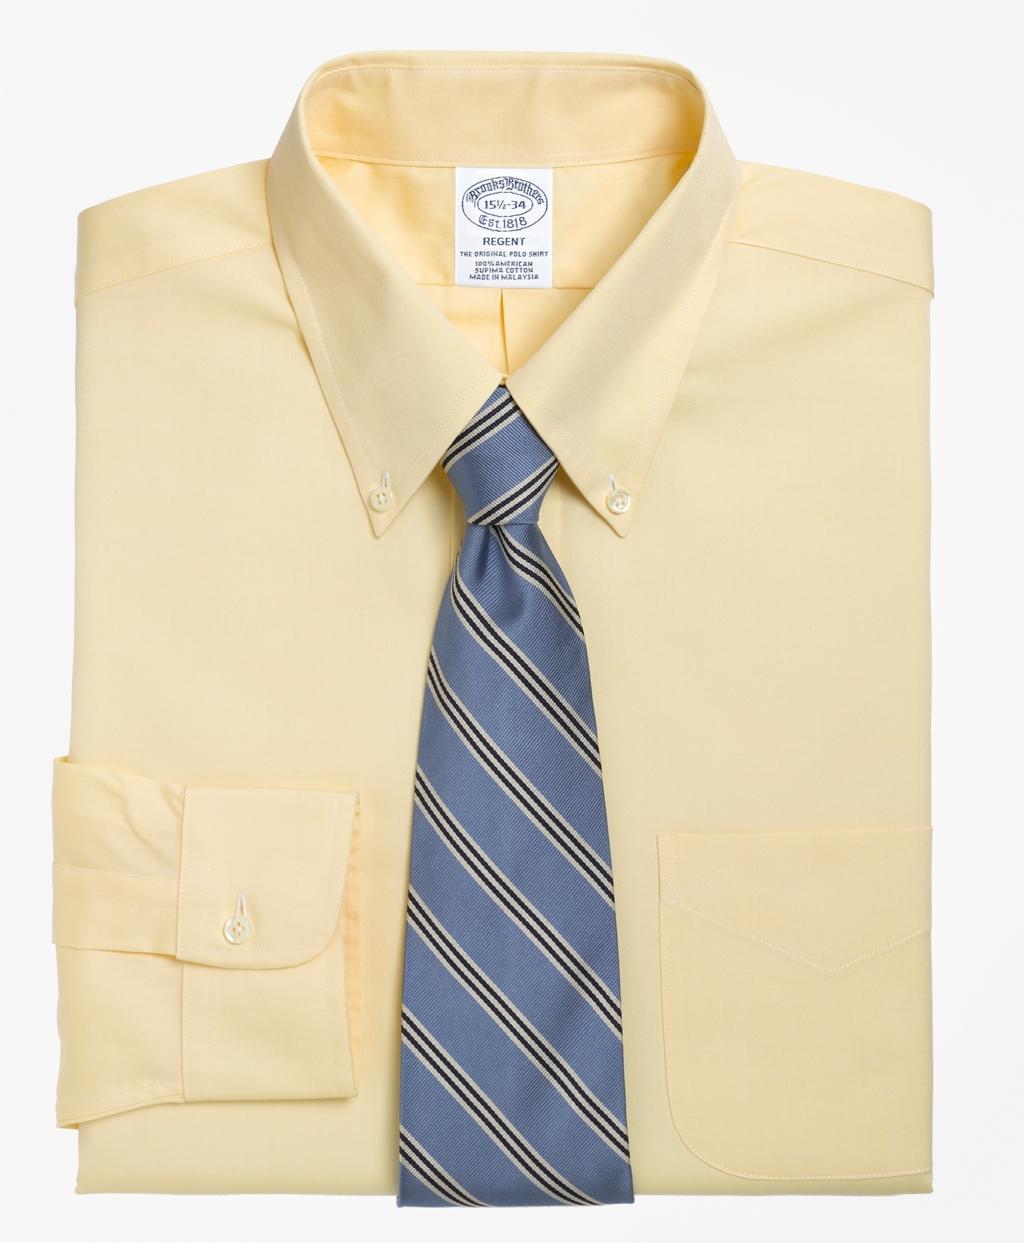 1930s Mens Shirts | Dress Shirts, Polo Shirts, Work Shirts Brooks Brothers Mens Slim Fitted Dress Shirt Button-Down Collar $69.50 AT vintagedancer.com